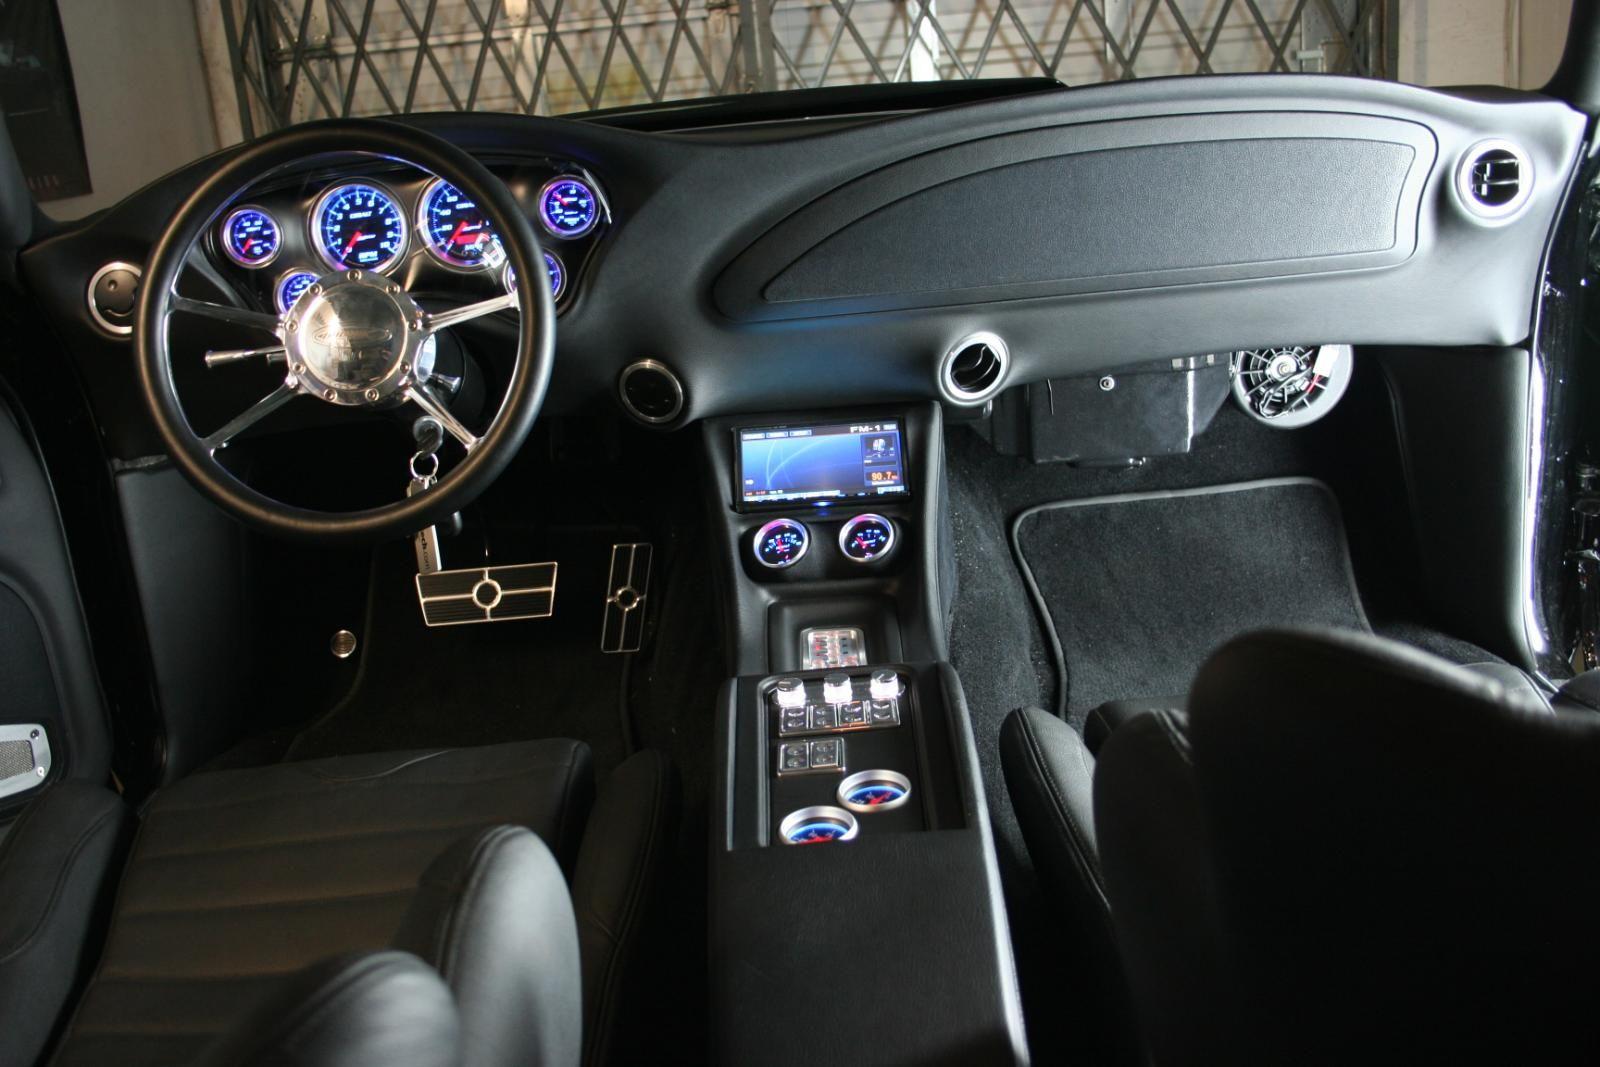 medium resolution of chevelle interior 1970 chevelle custom dash and interior pics